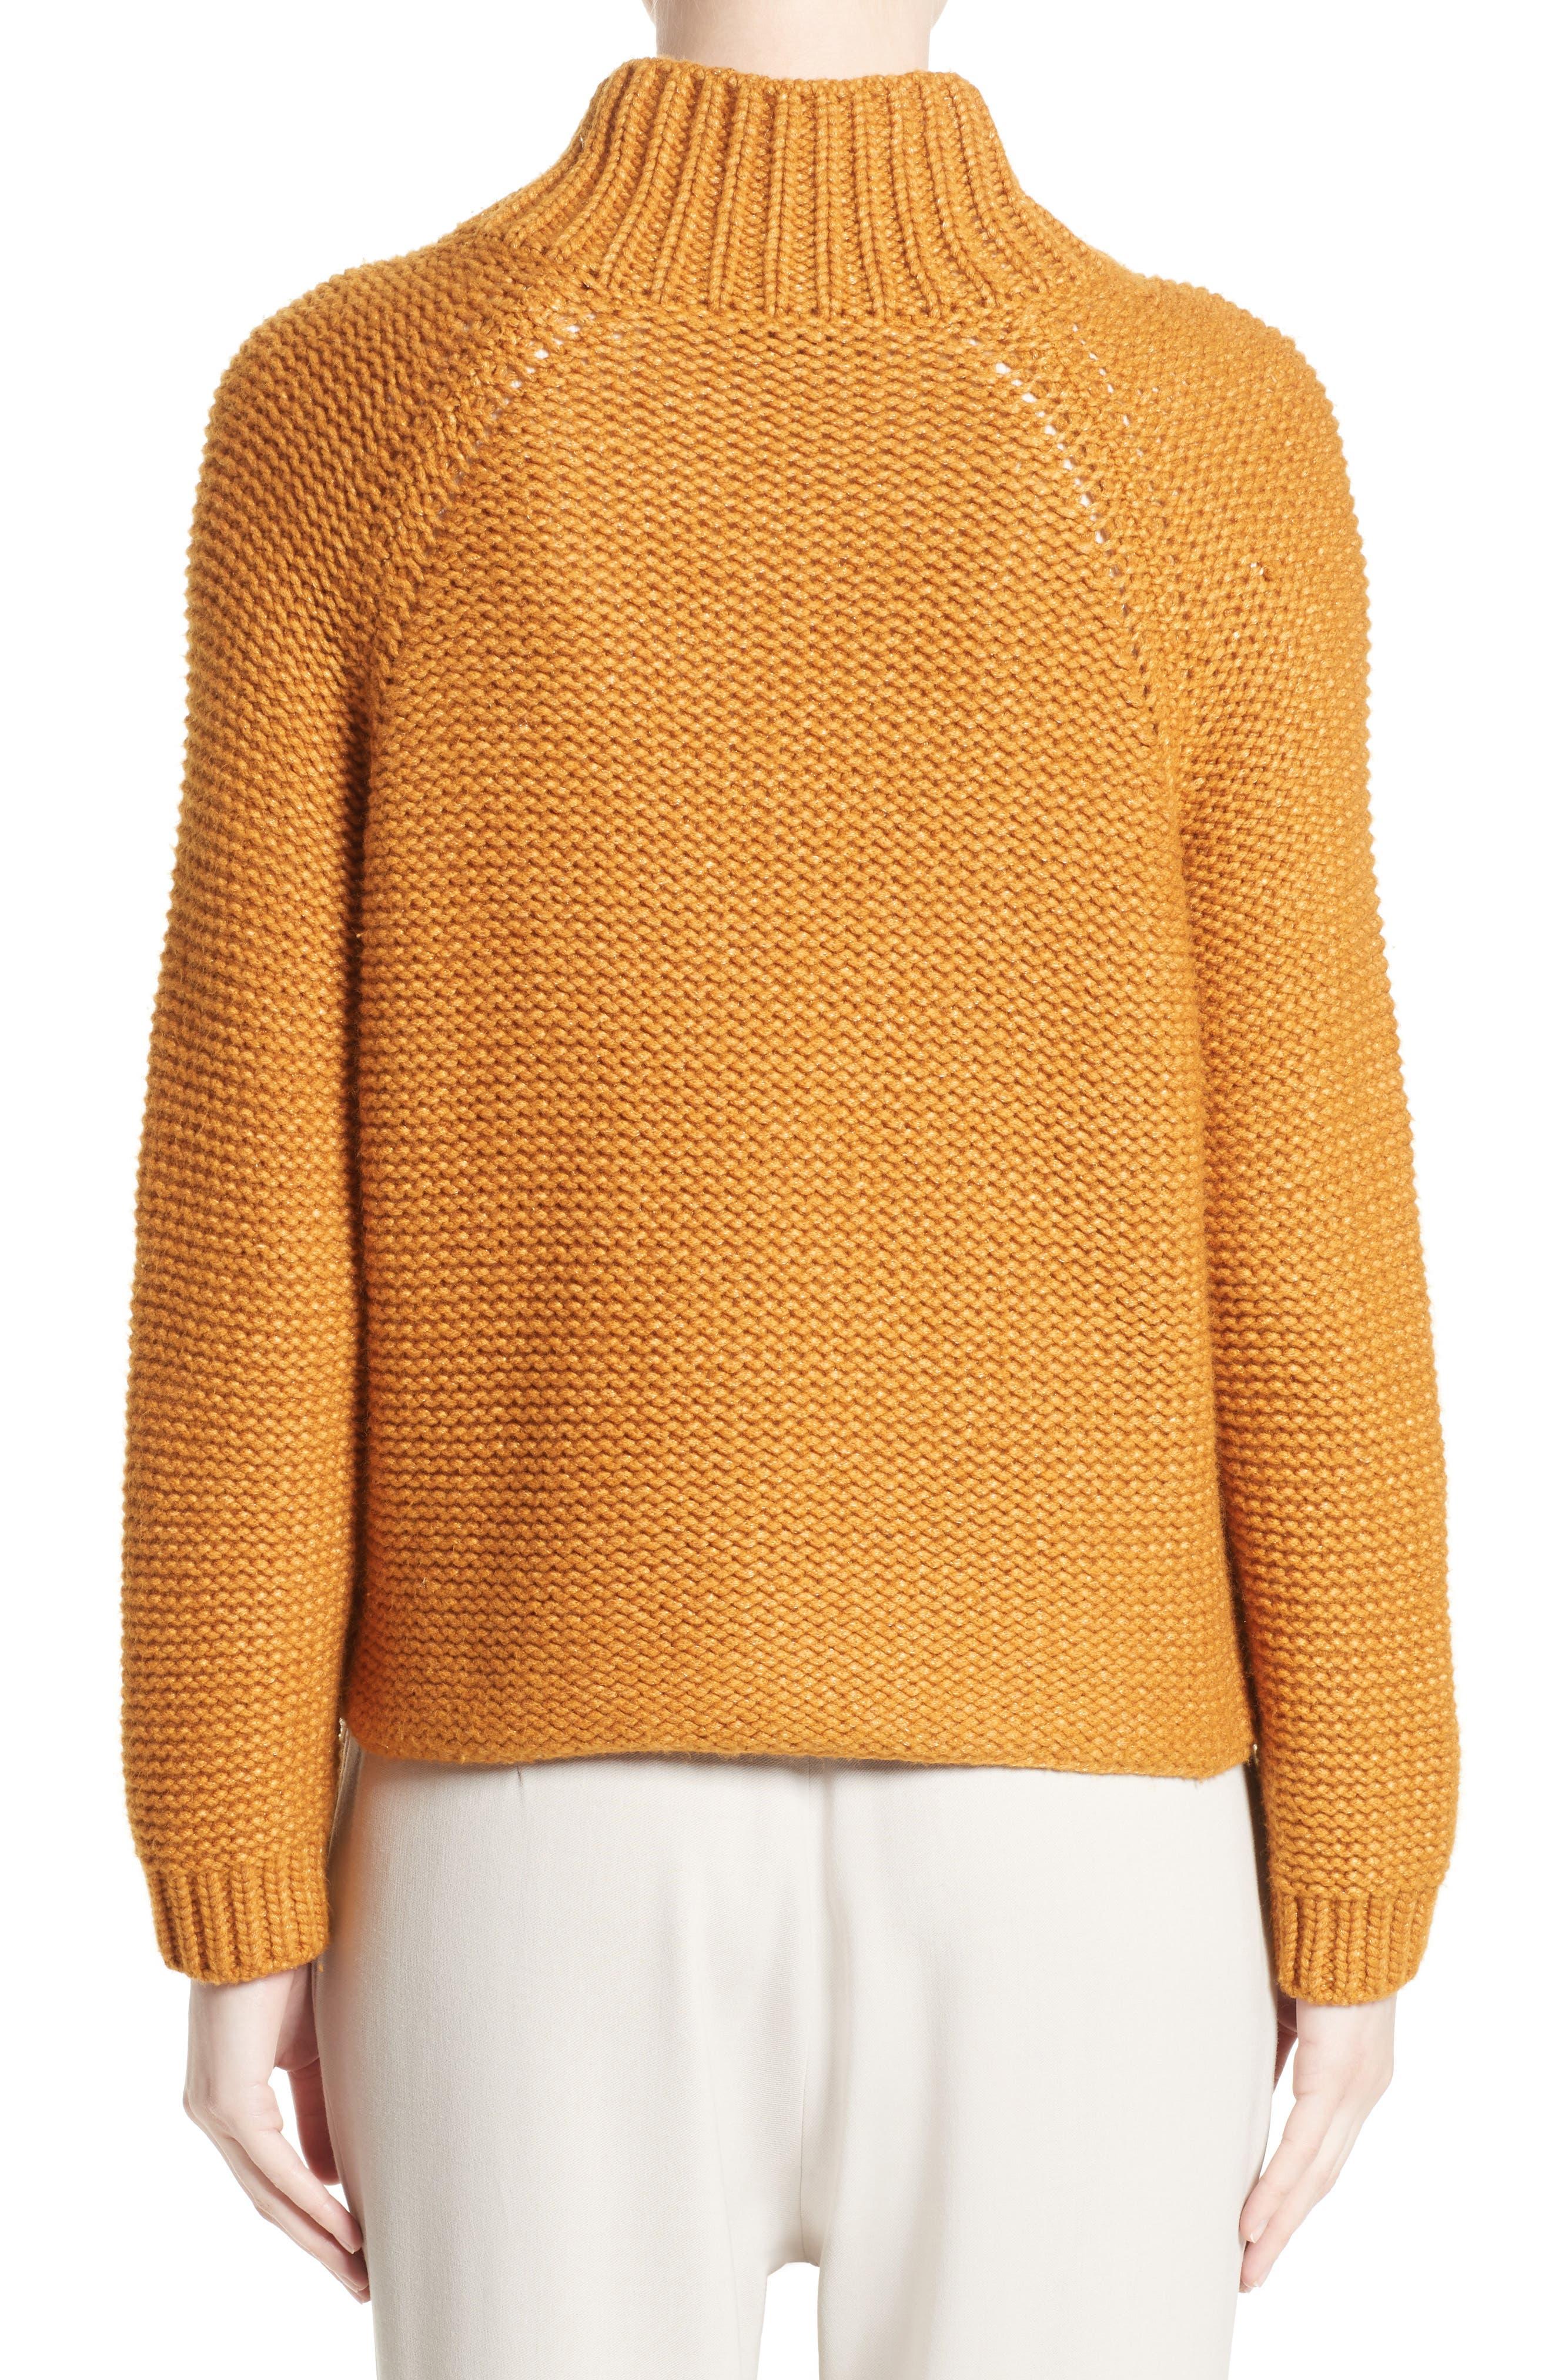 Knit Wool Blend Cardigan,                             Alternate thumbnail 2, color,                             220